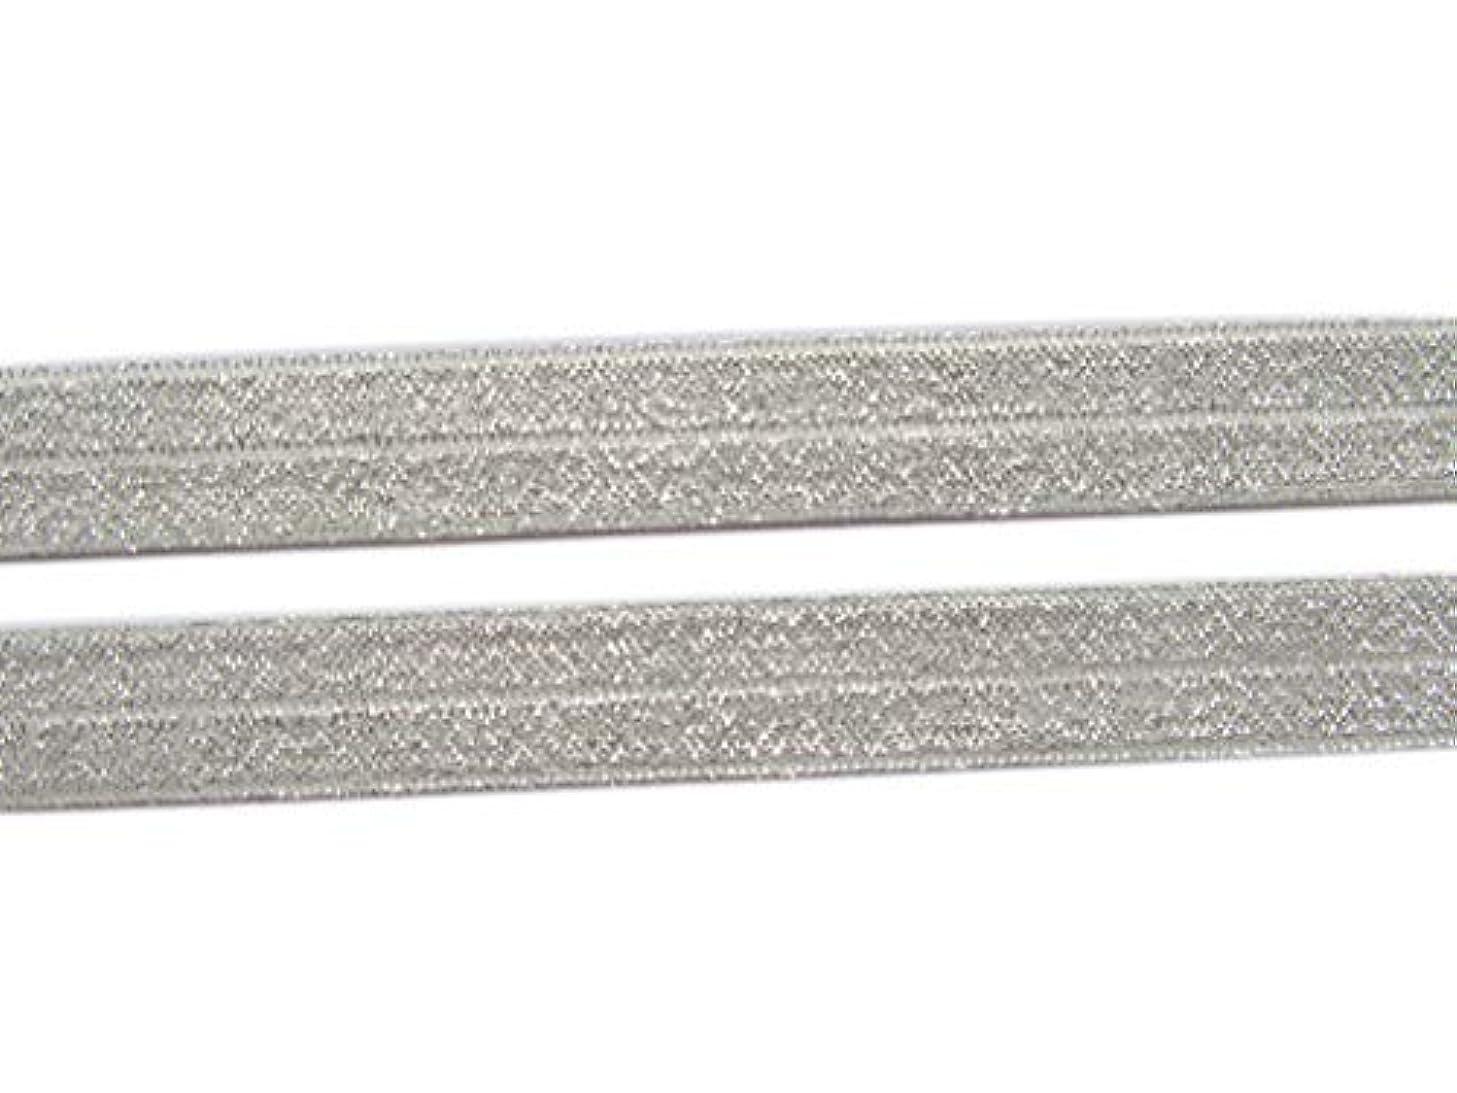 XiXiboutique 15 Yards Glitter Fold Over Elastic Stretch Foldover FOE Elastics for Hair Ties Headbands(Silver)